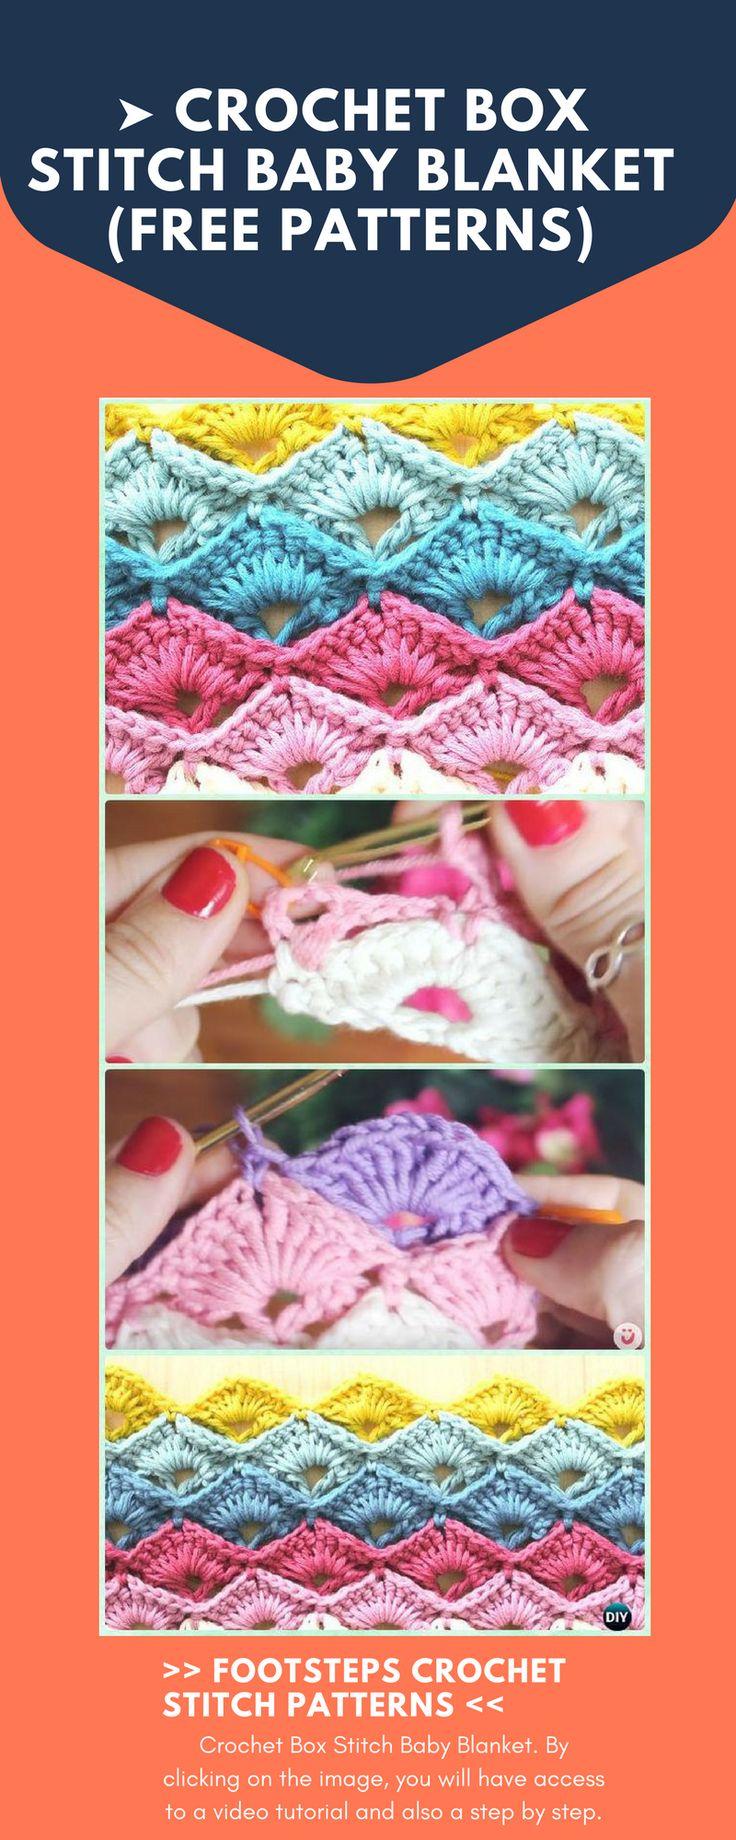 ➤ Crochet Box Stitch Baby Blanket (FREE PATTERNS)